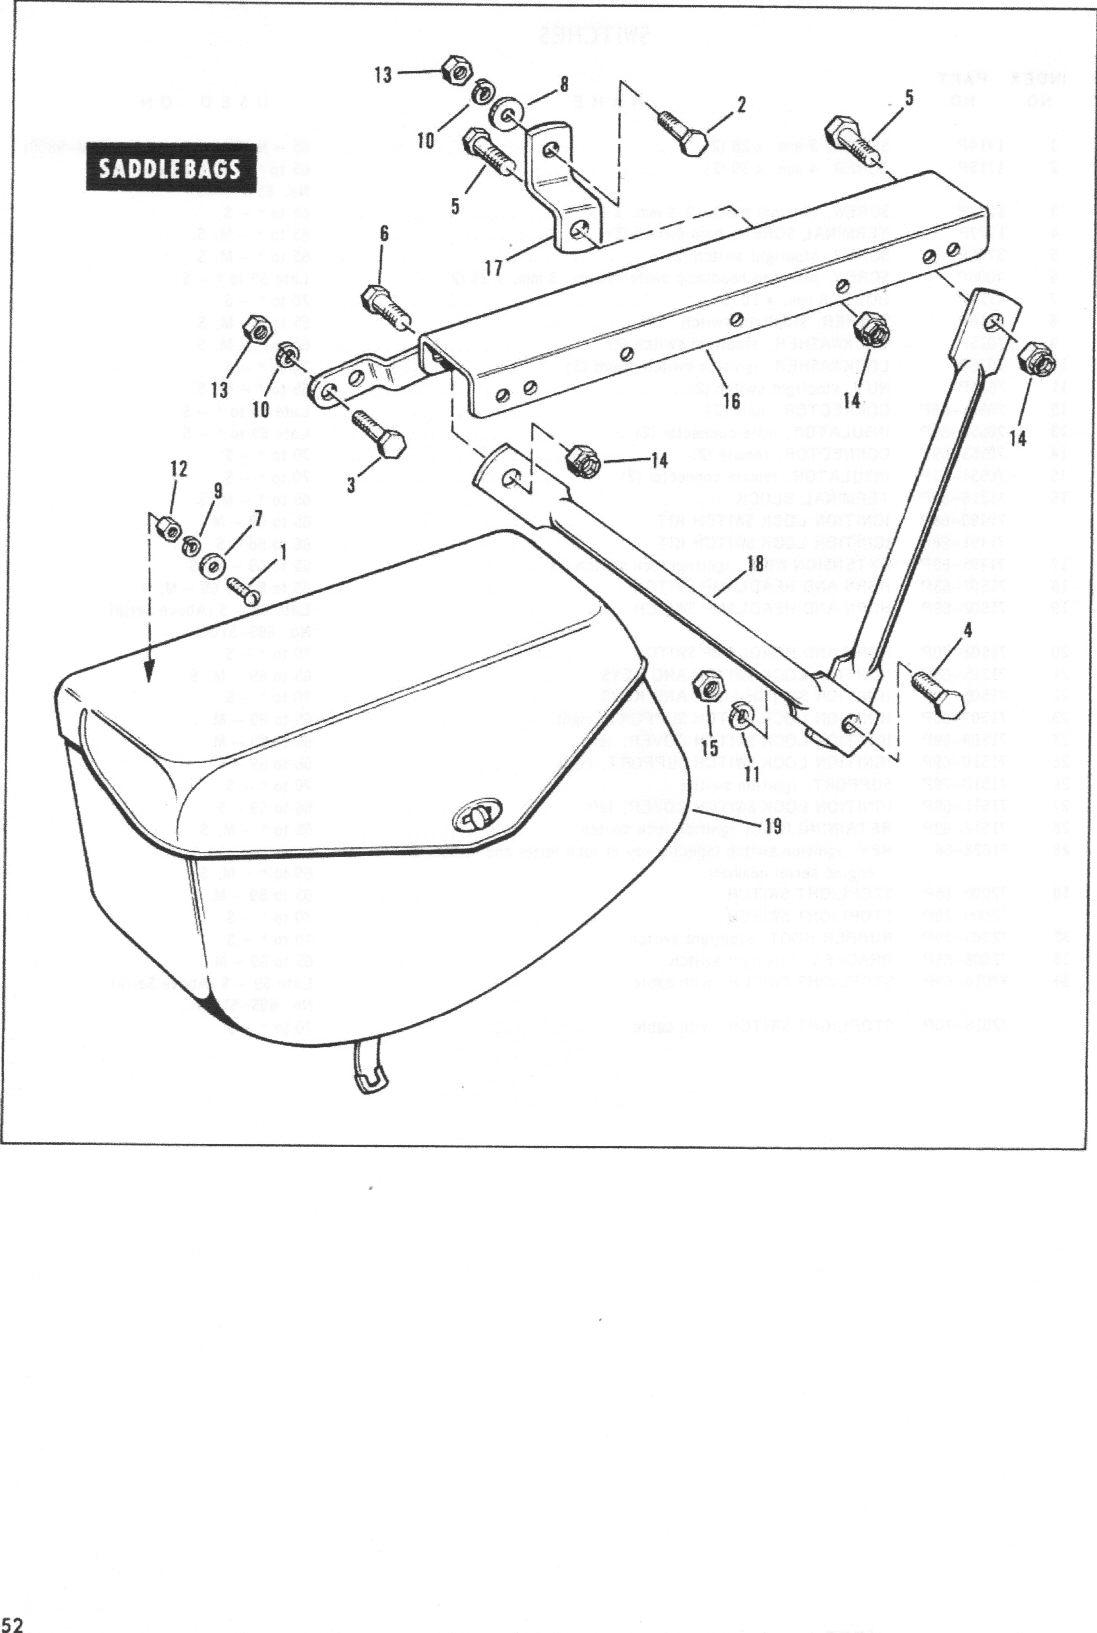 harley m50 engine diagram heating furnace wiring